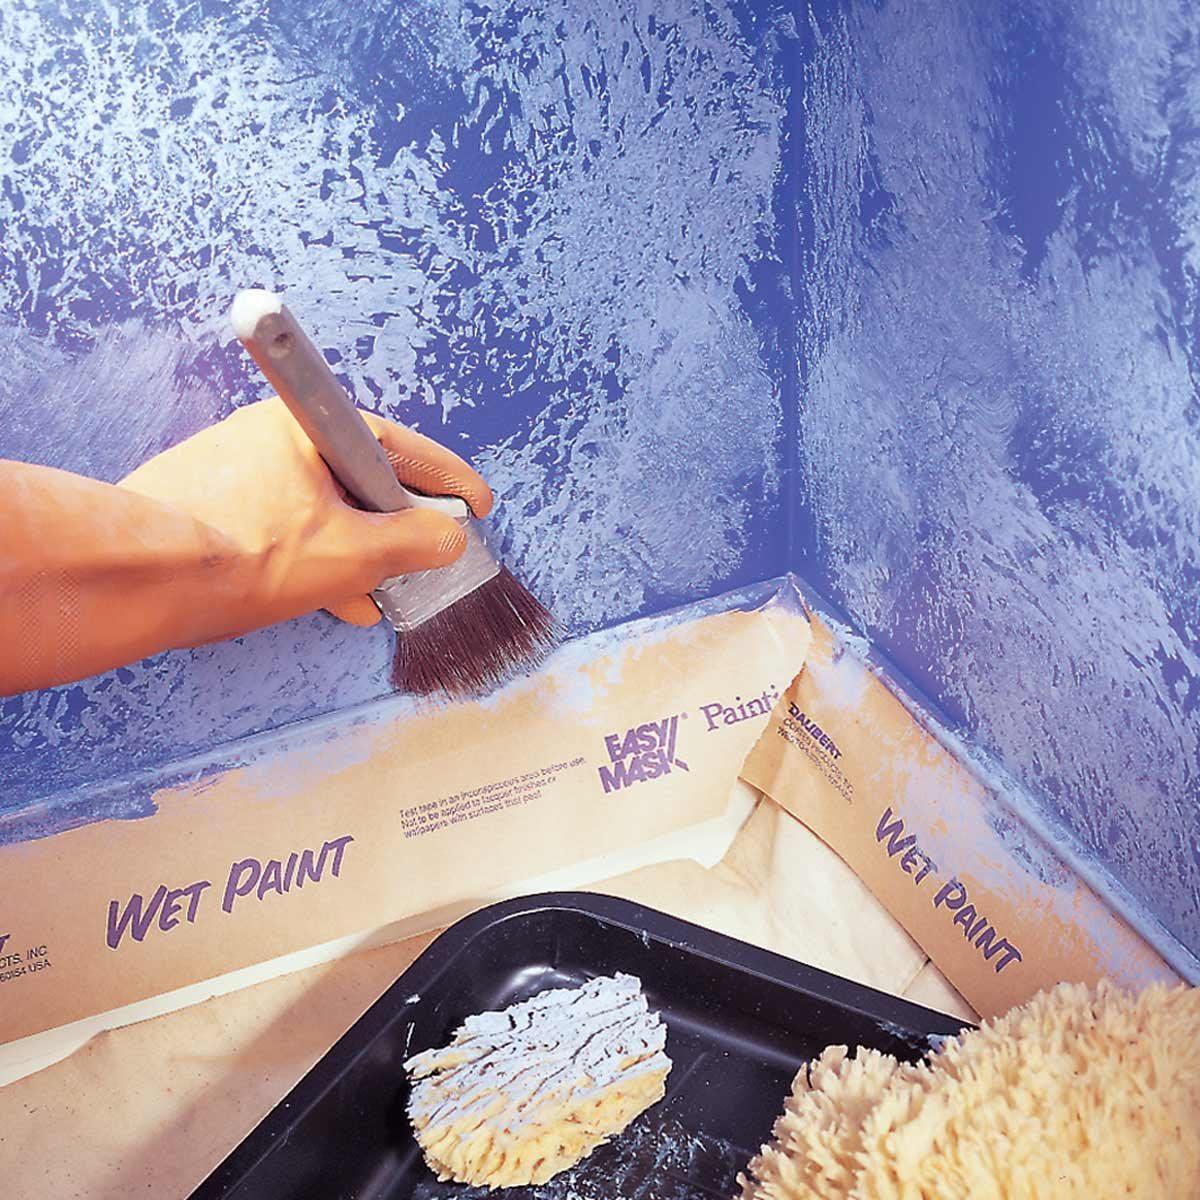 FH98MAY_01344003-1200 sponge paint